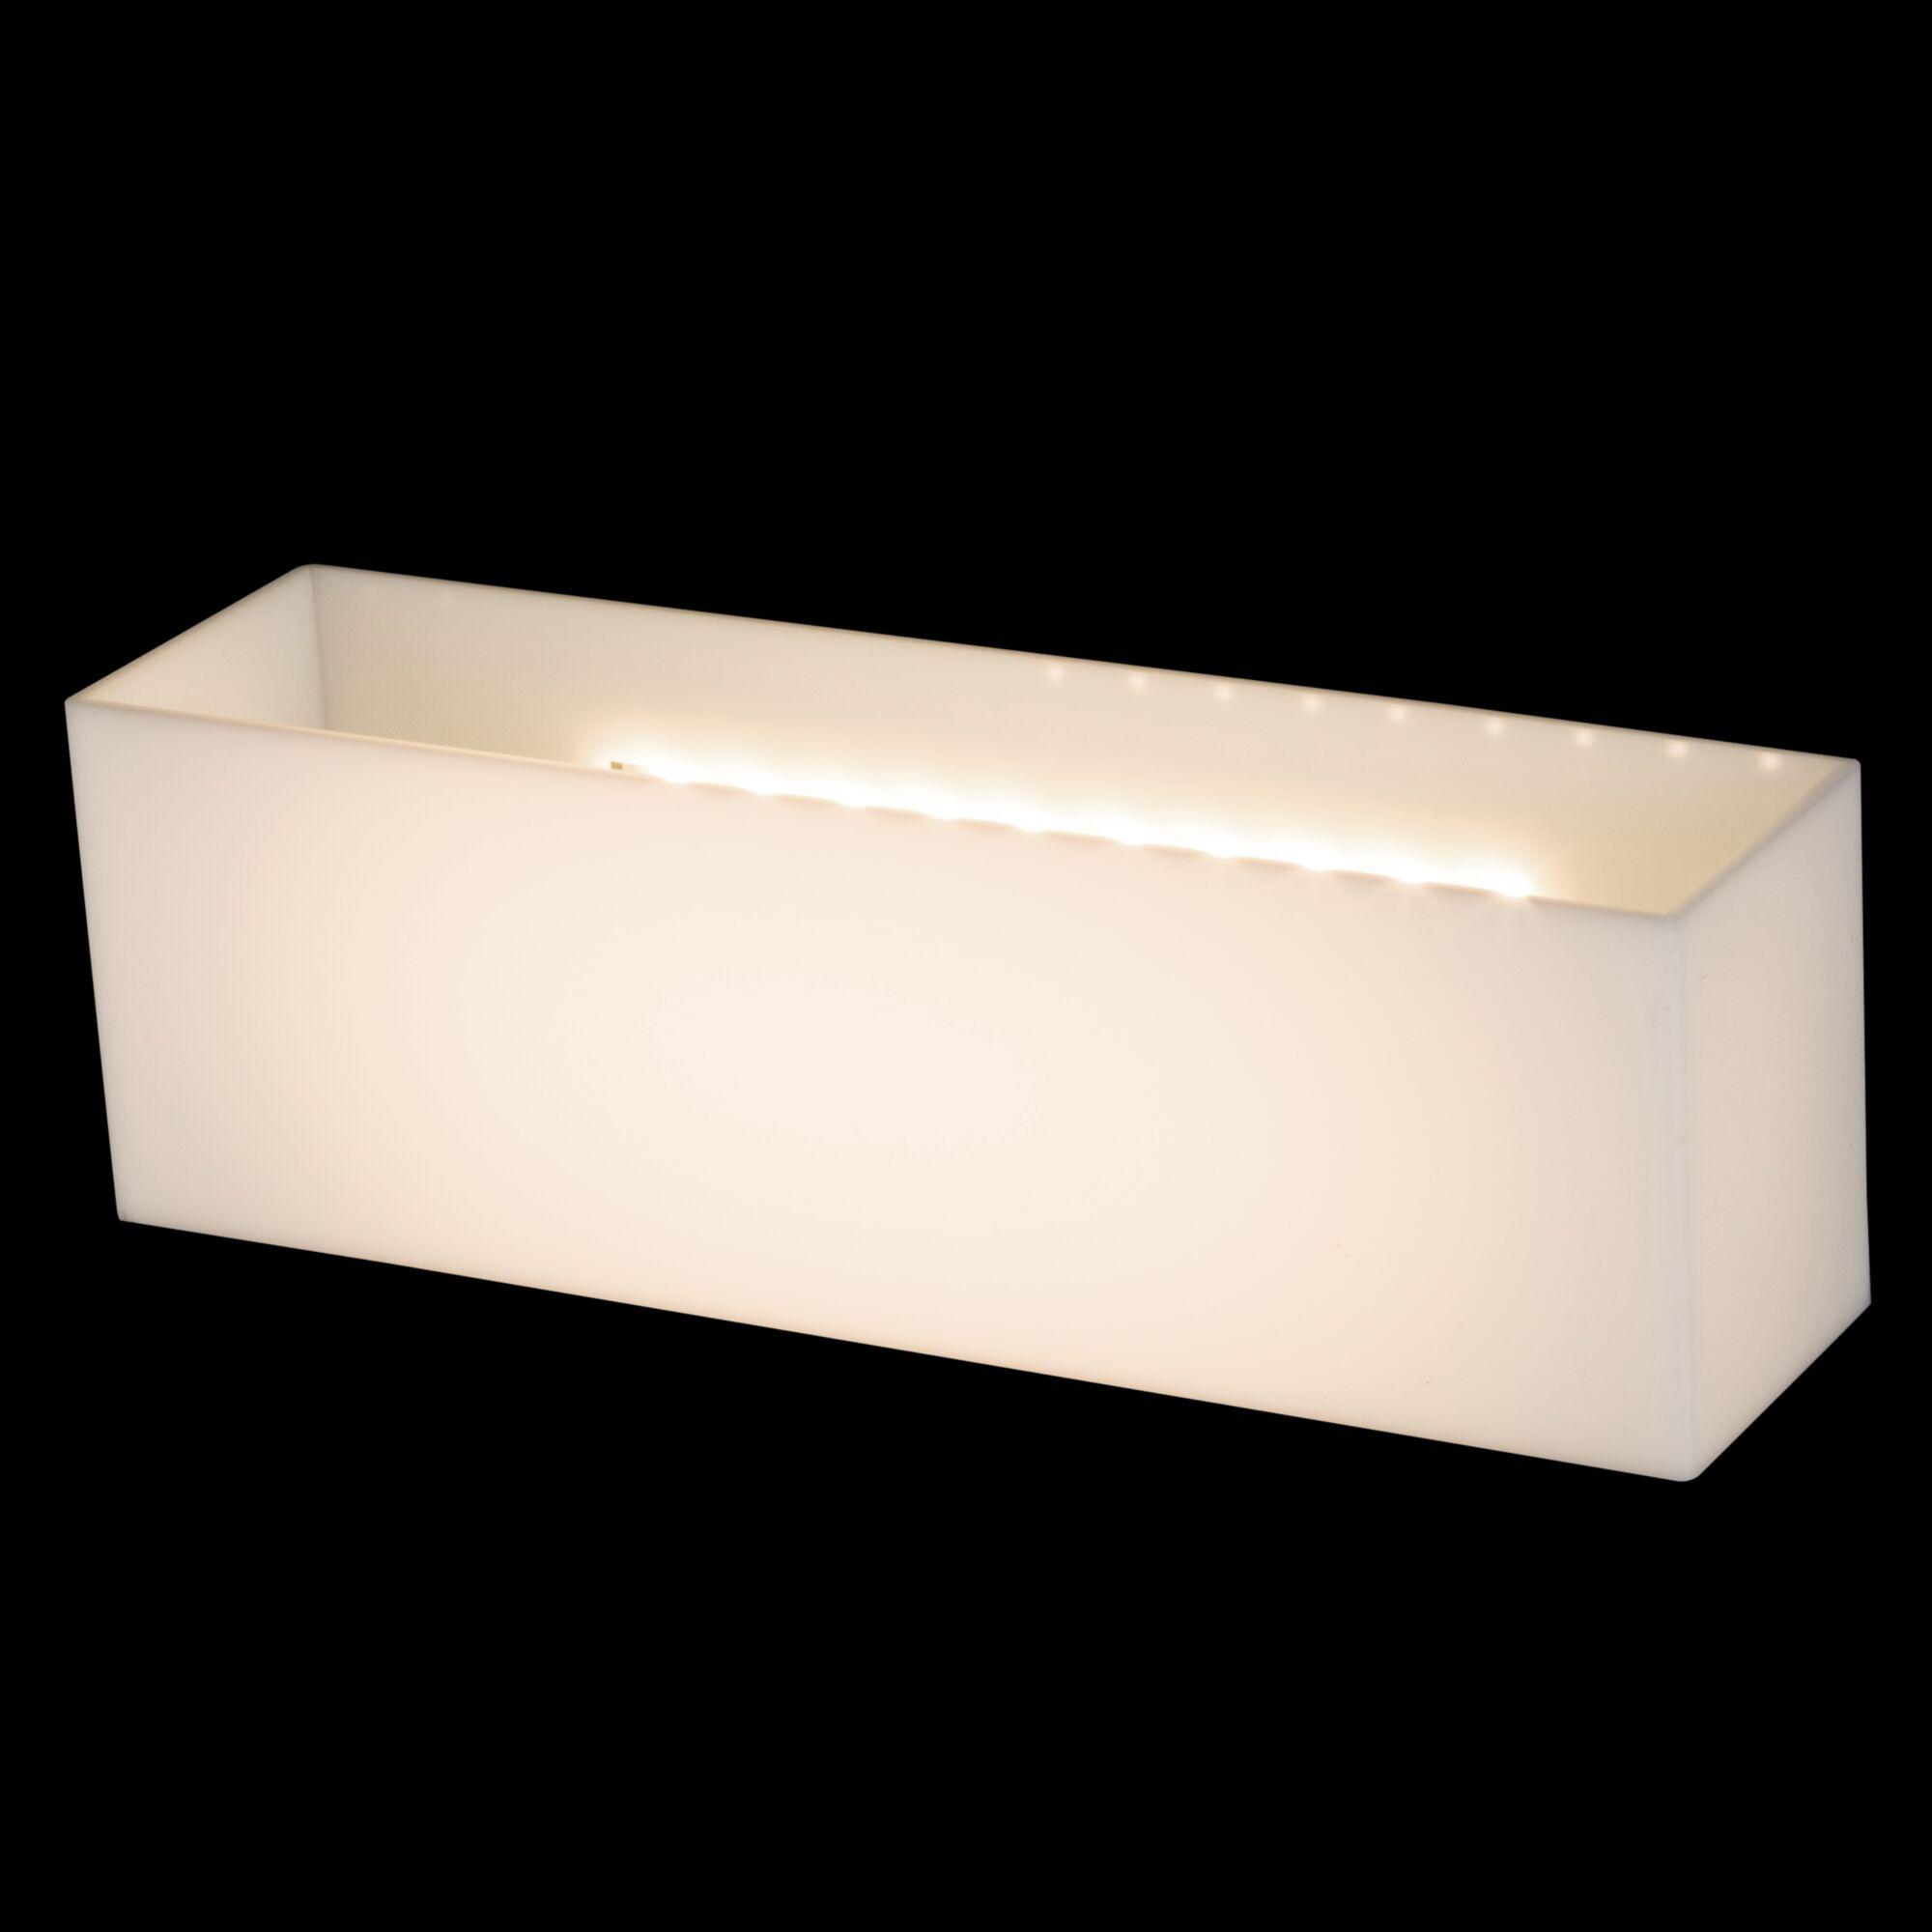 Настенный светильник Maytoni O009WL L10S